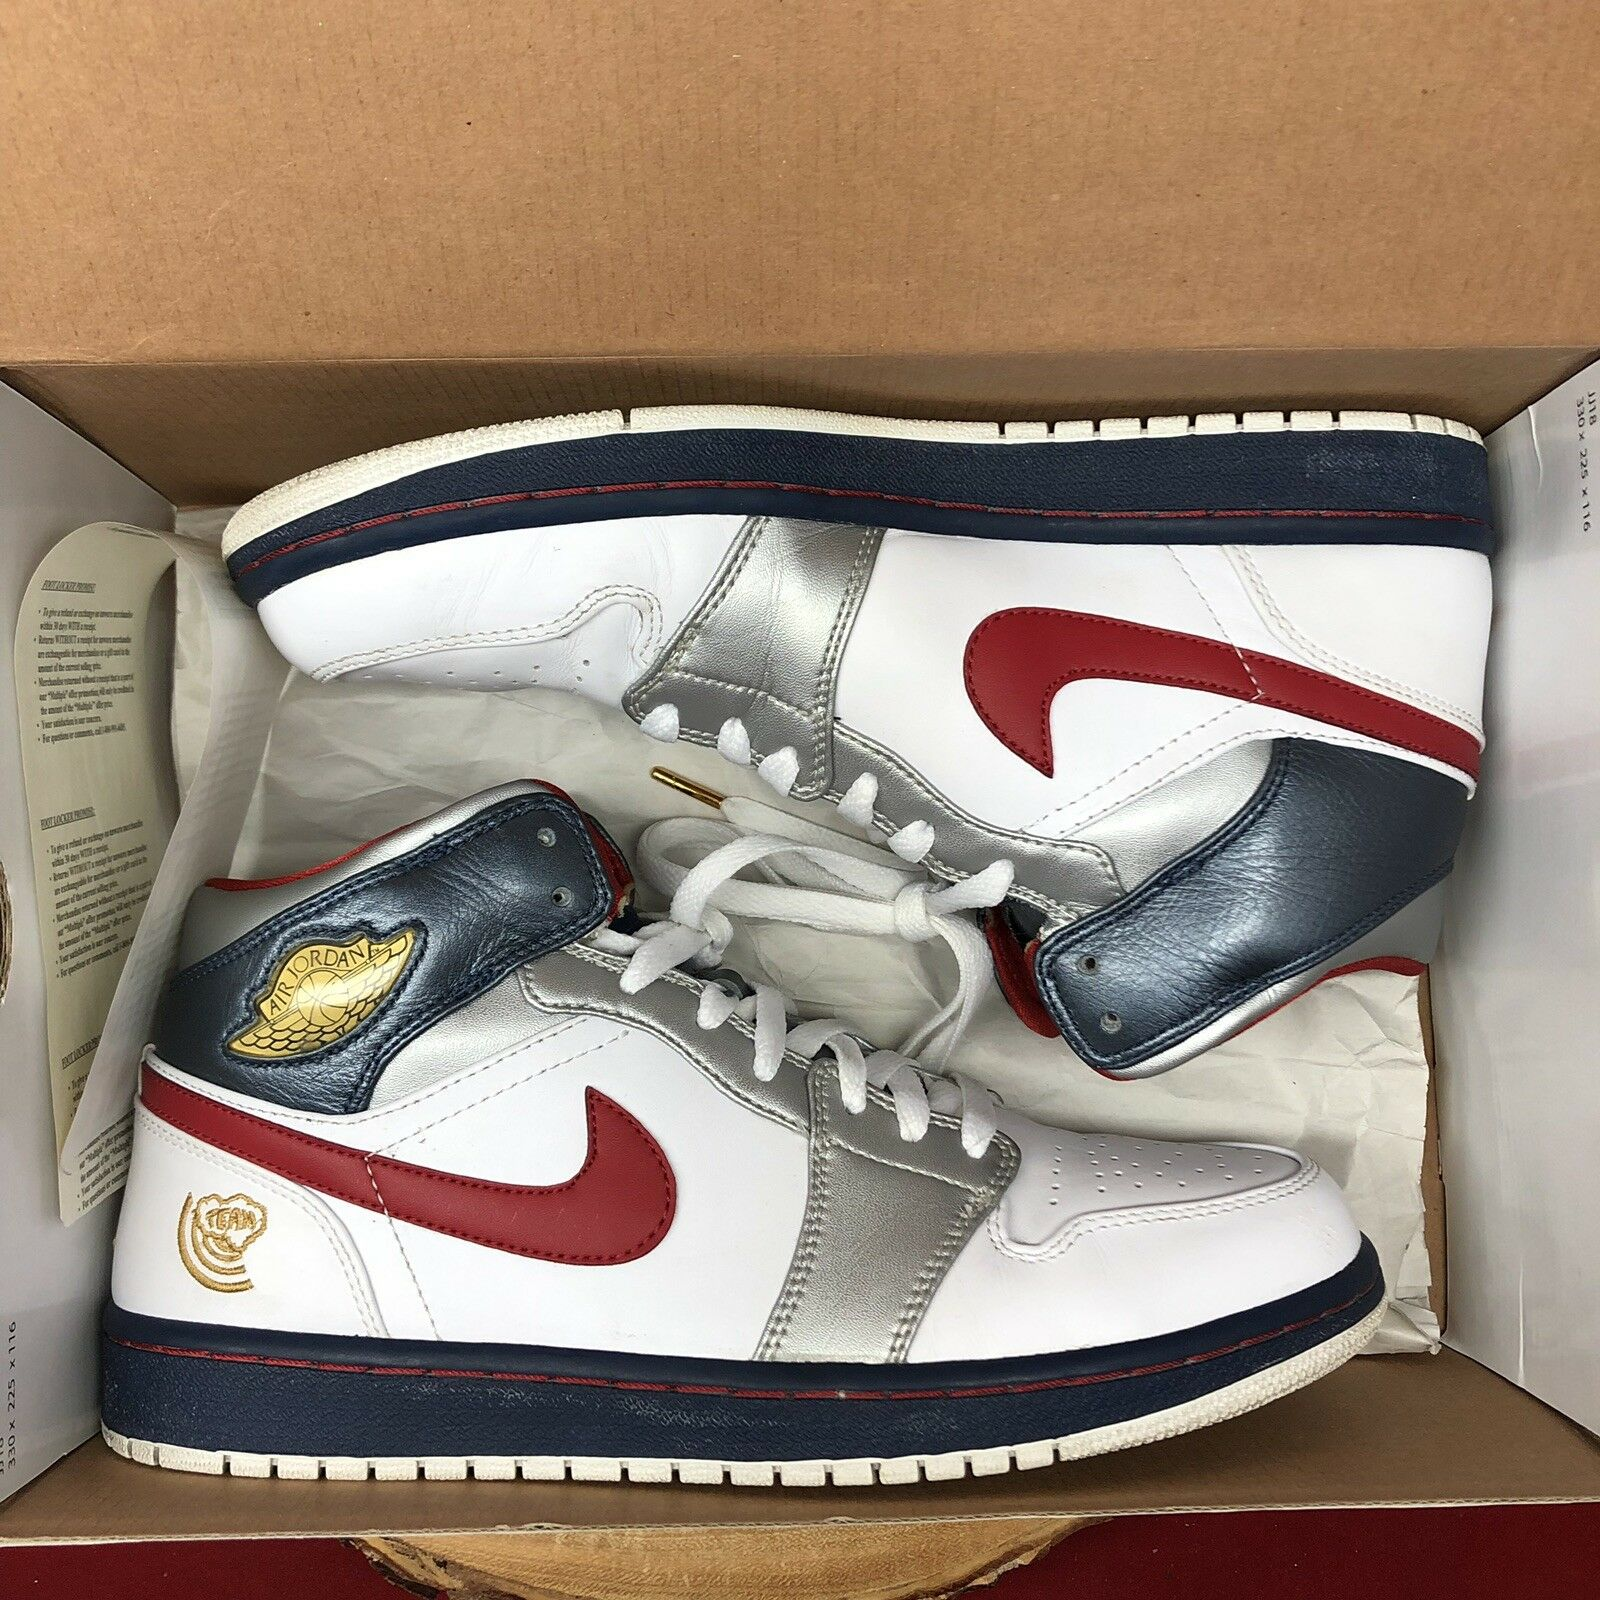 Nike Air Jordan 1 I Retro 'Olympic' USA Red White bluee 136085 161 Size 10.5